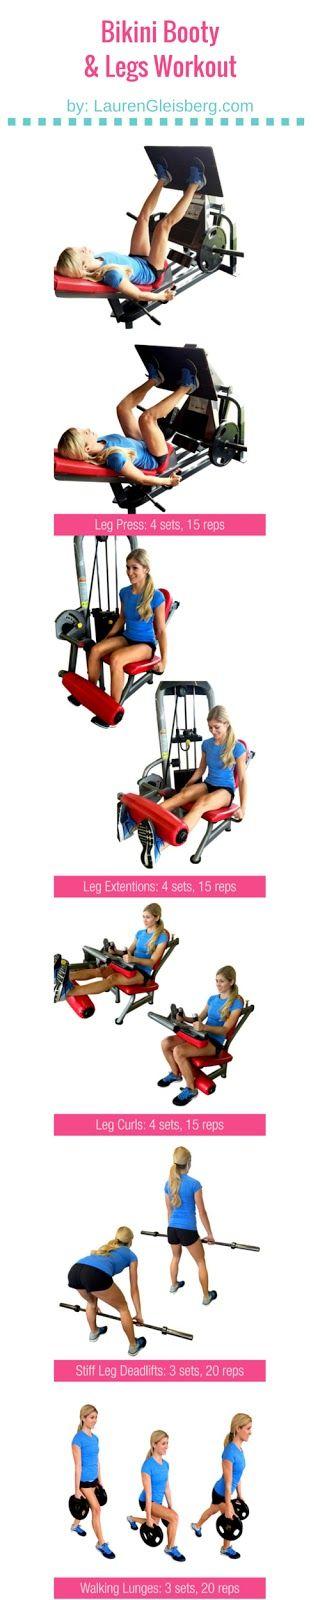 Legs & Glutes (ConfidenceKini Challenge) - 4/13